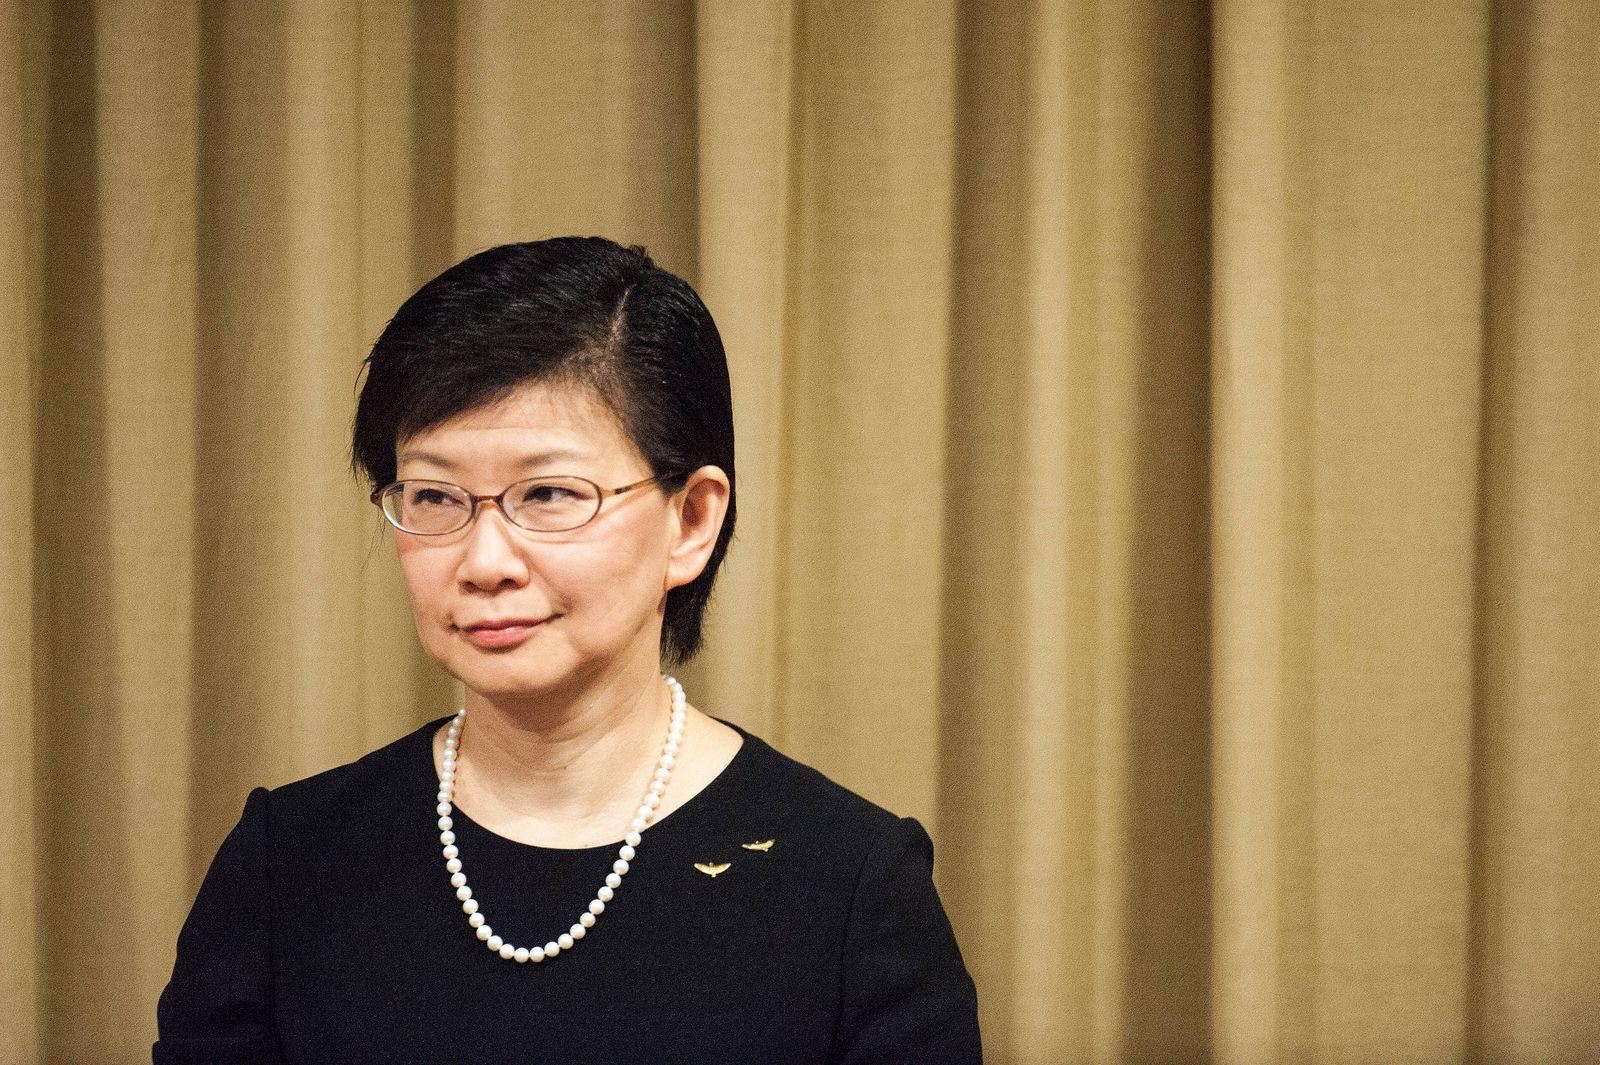 NO FRANCE NO SWITZERLAND November 10 2017 Mrs Izumi Nakamitsu UN High Representative for Dis